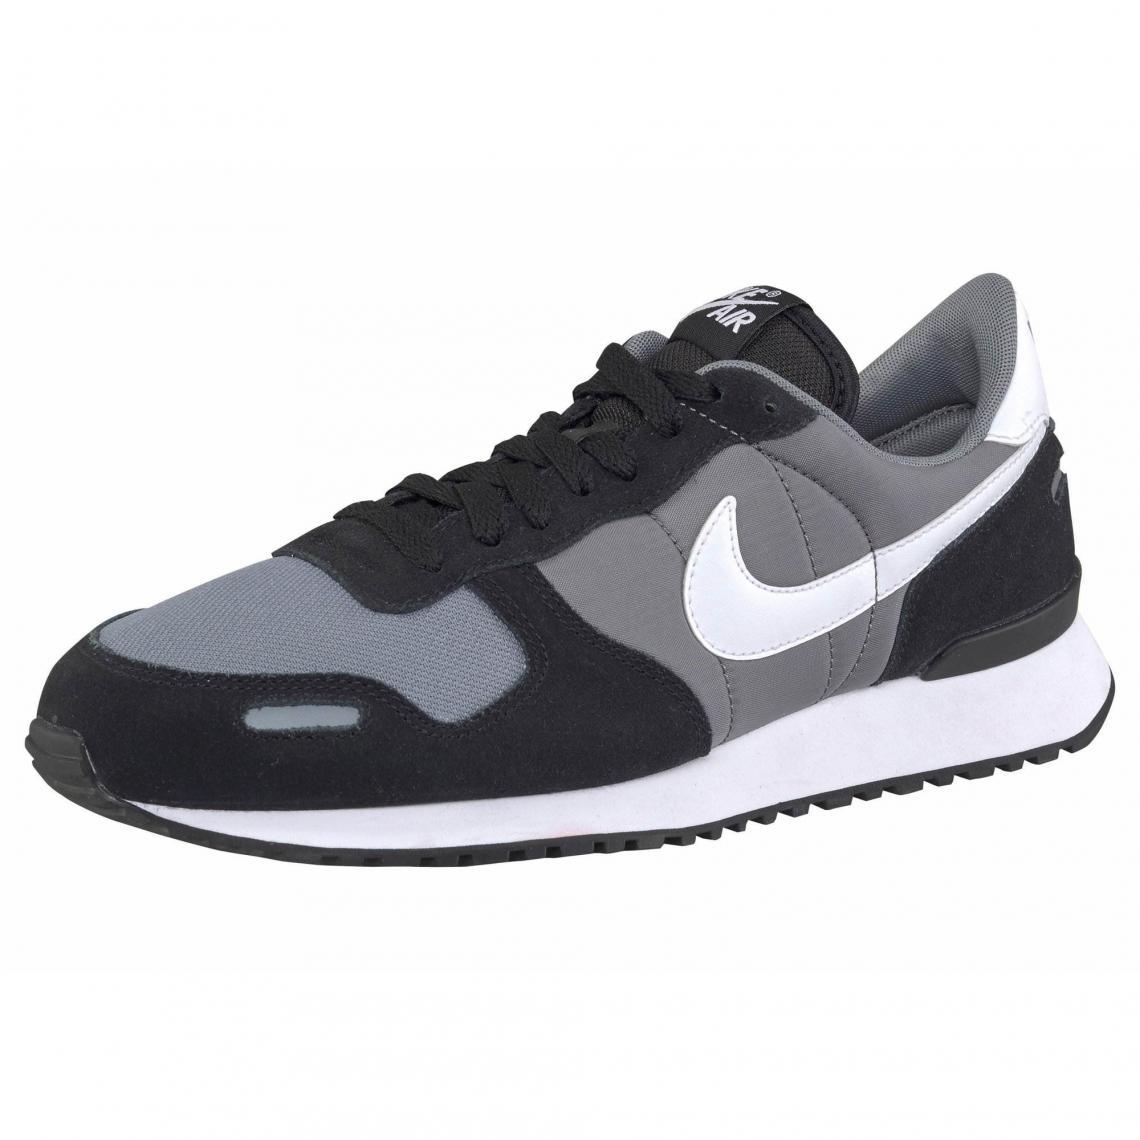 53af12ec045 Nike Air Vortex chaussures de running homme - Noir - Gris Nike Homme